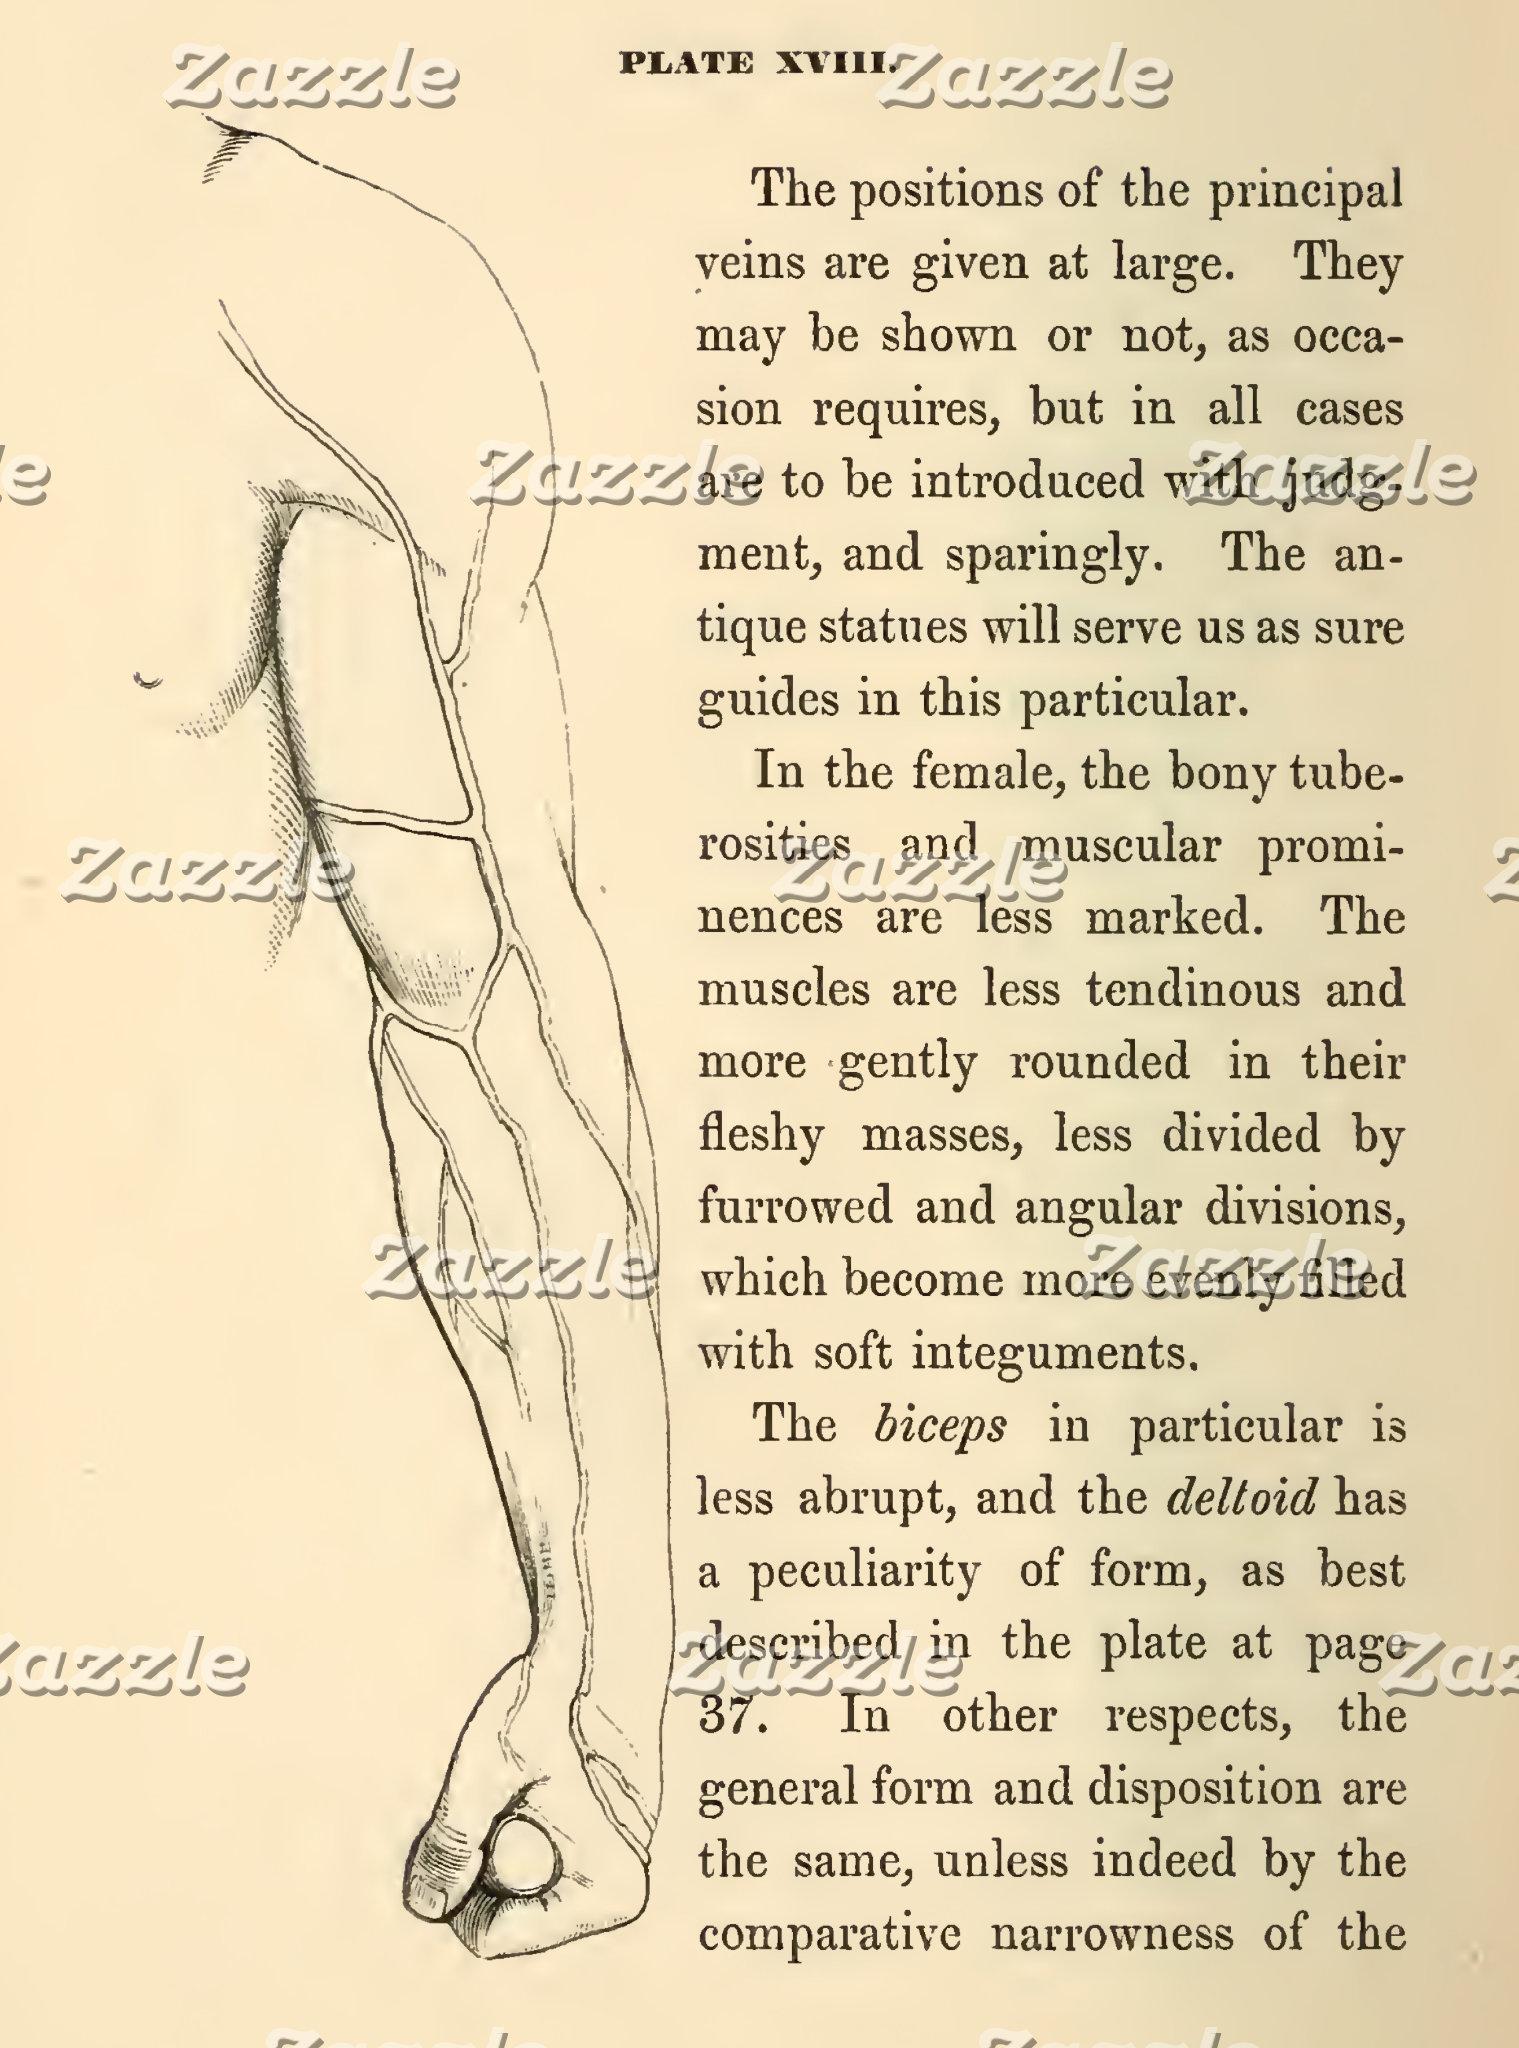 Vintage Anatomy | Veins of the Arm